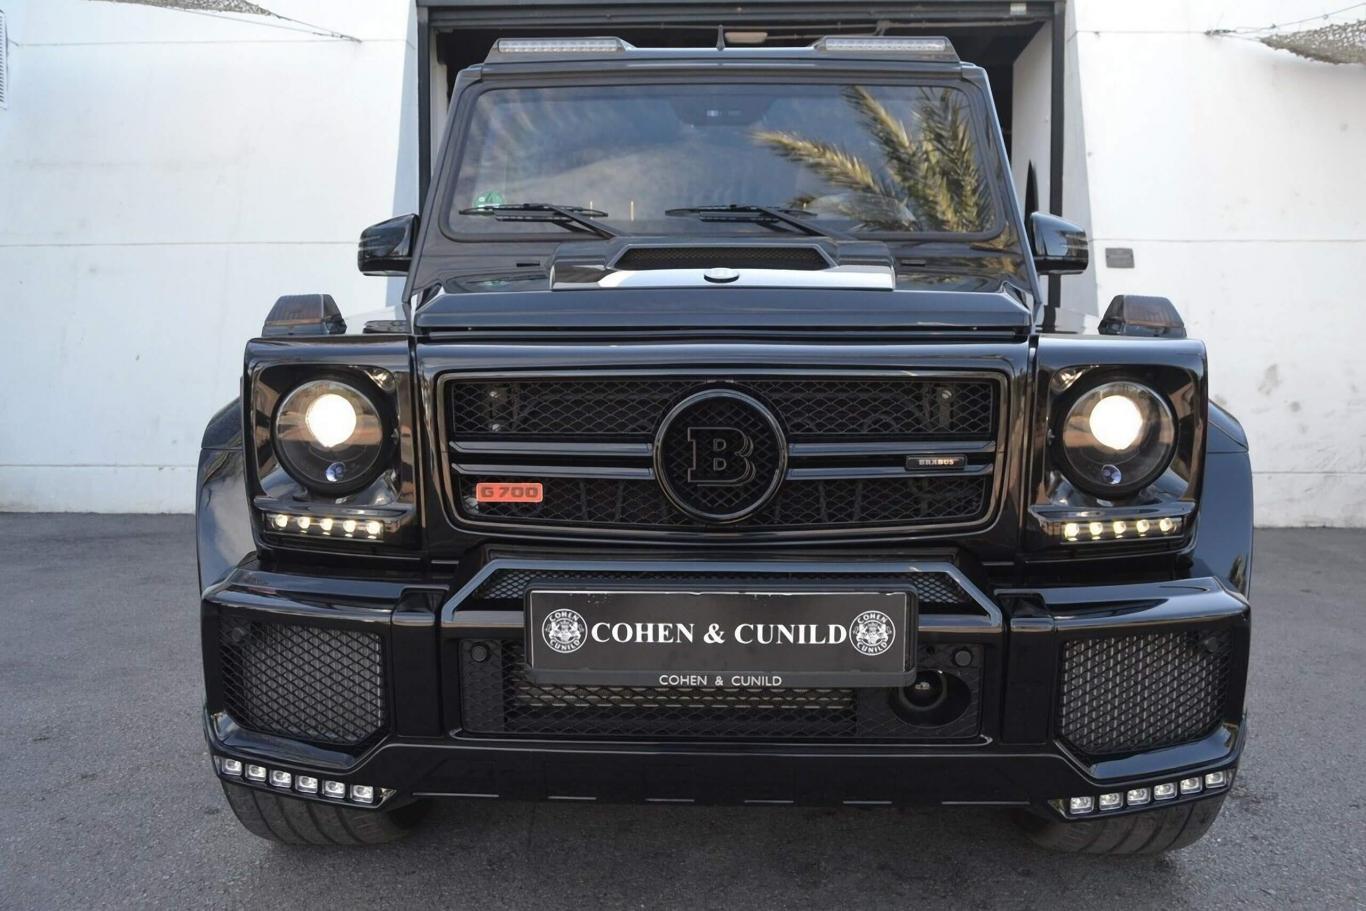 Mercedes Benz Brabus >> Mercedes Benz Brabus G700 5 5 V8 700cv De Plates Armoured